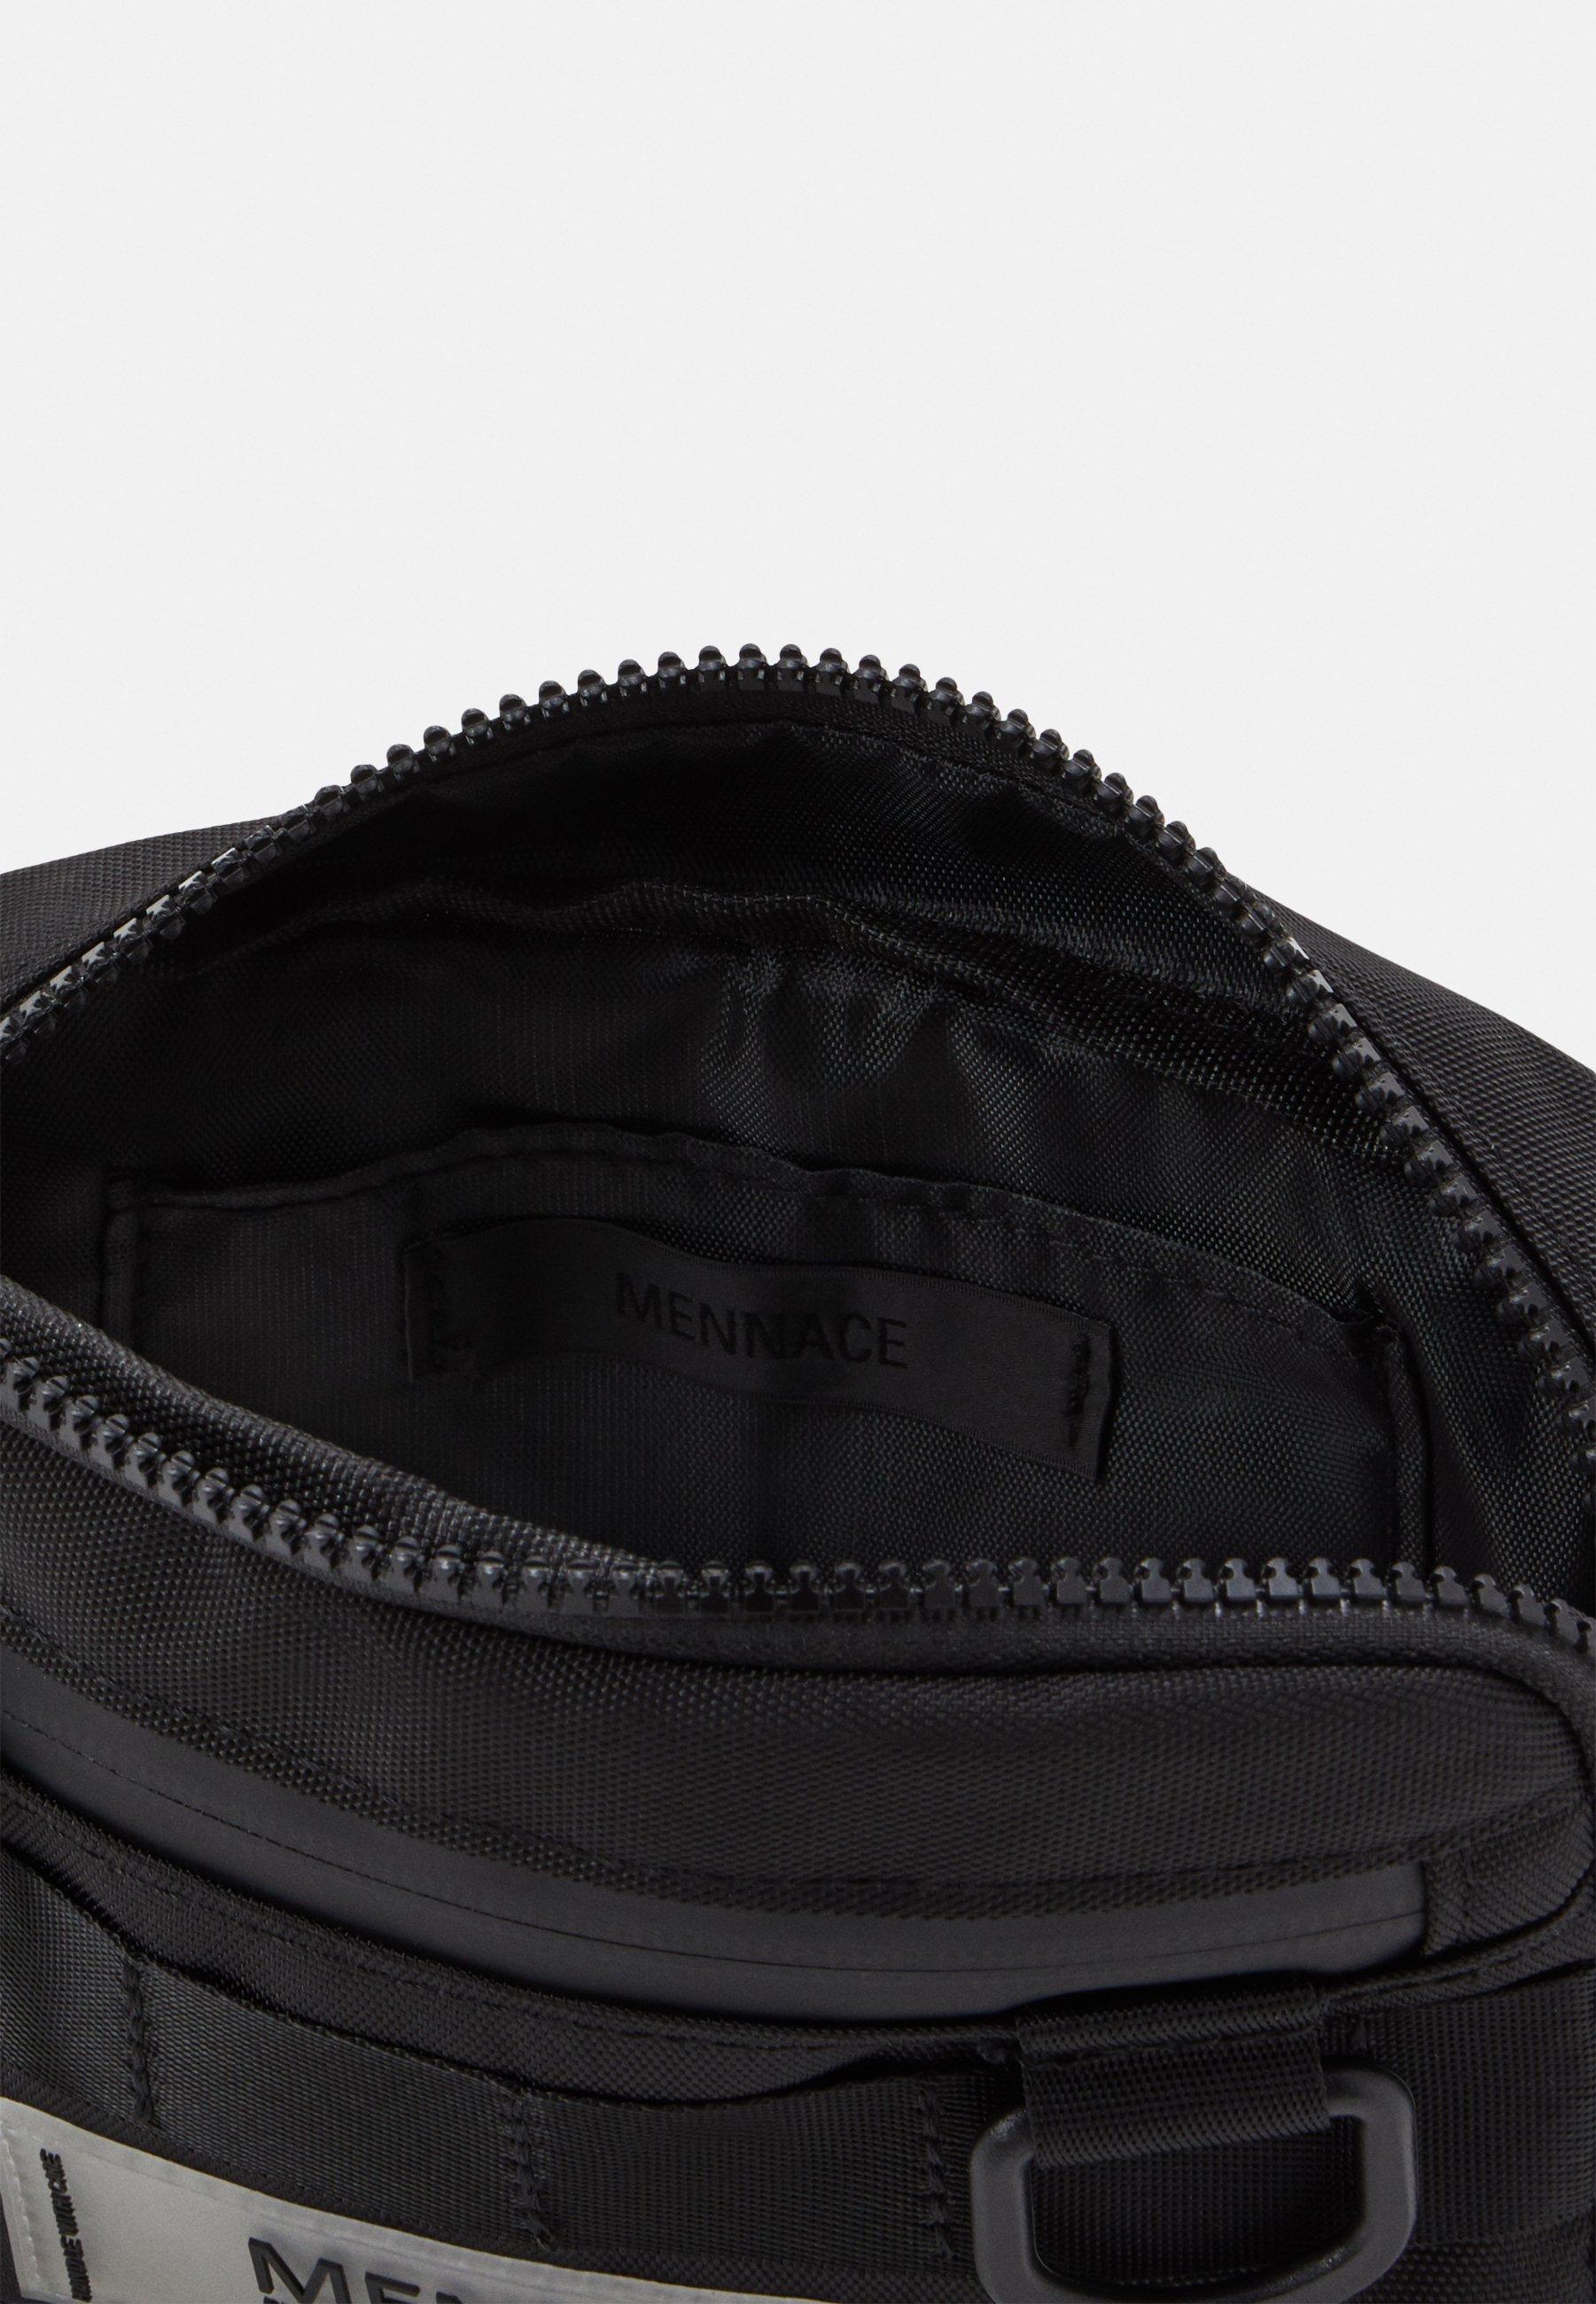 Mennace UTILITY BUM BAG - Rumpetaske - black/svart yXMUiF1p9qUbyZc